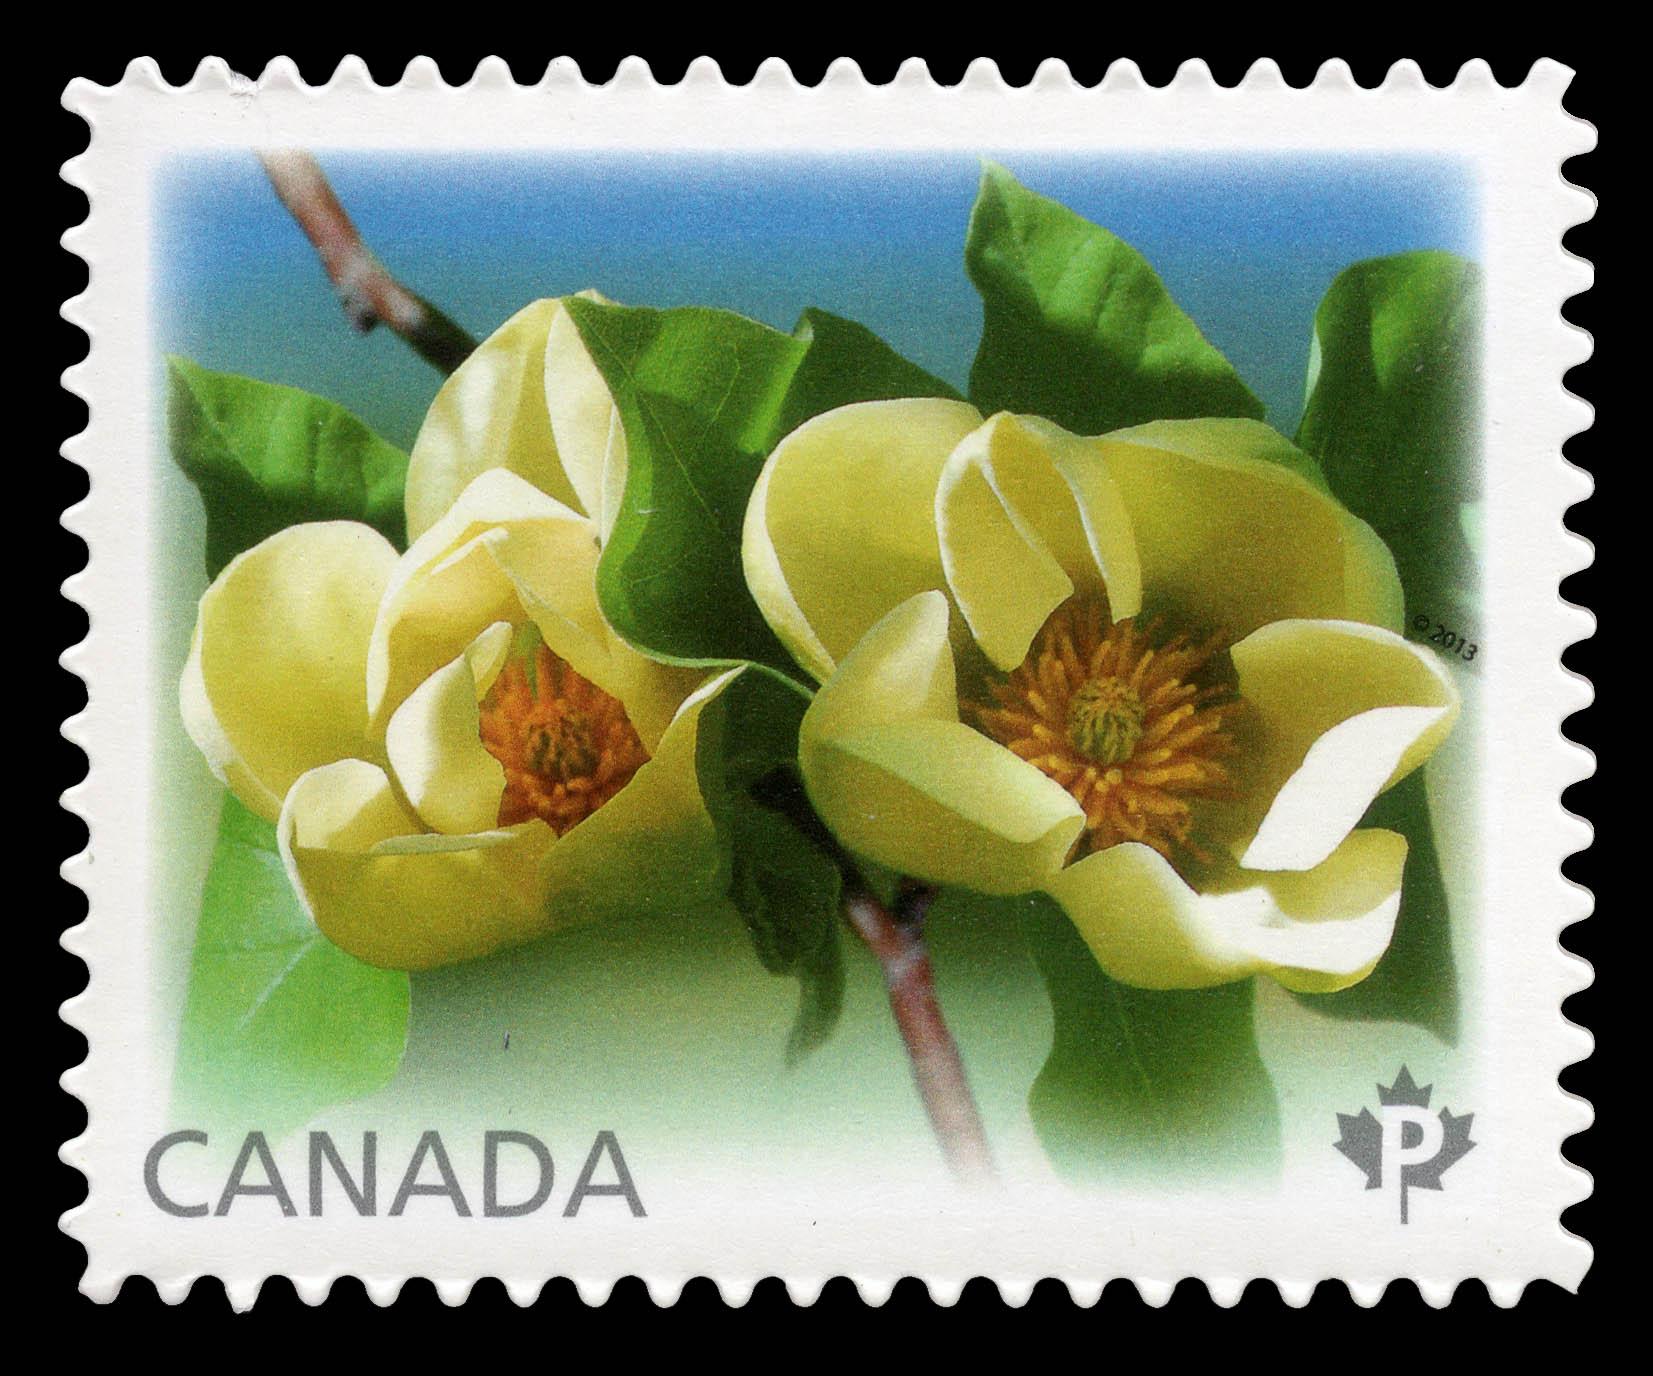 Yellow Bird Magnolias Canada Postage Stamp   Magnolias